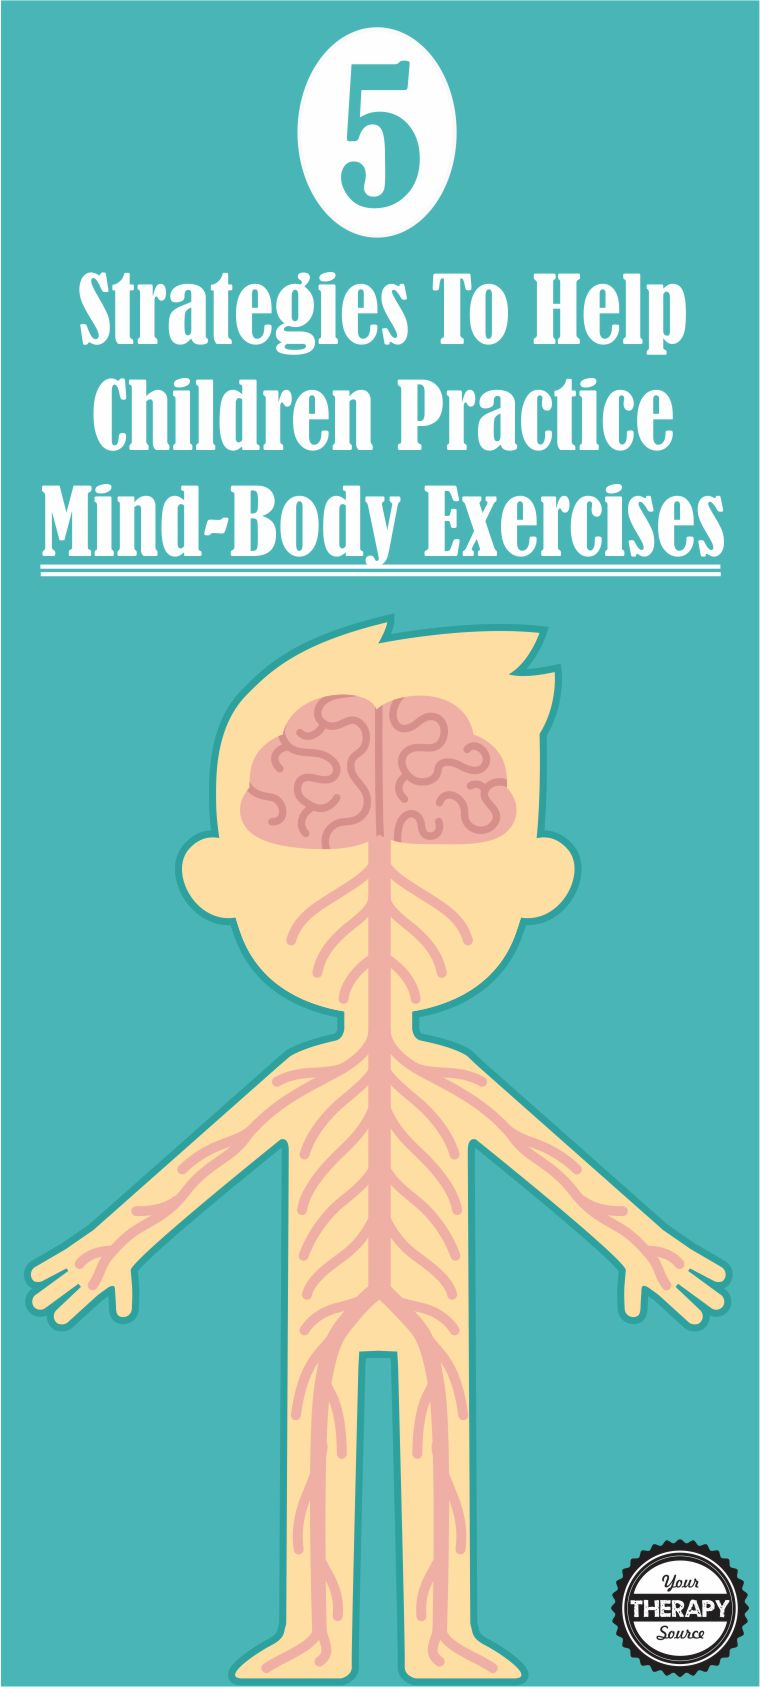 5 Strategies To Help Children Practice Mind-Body Exercises